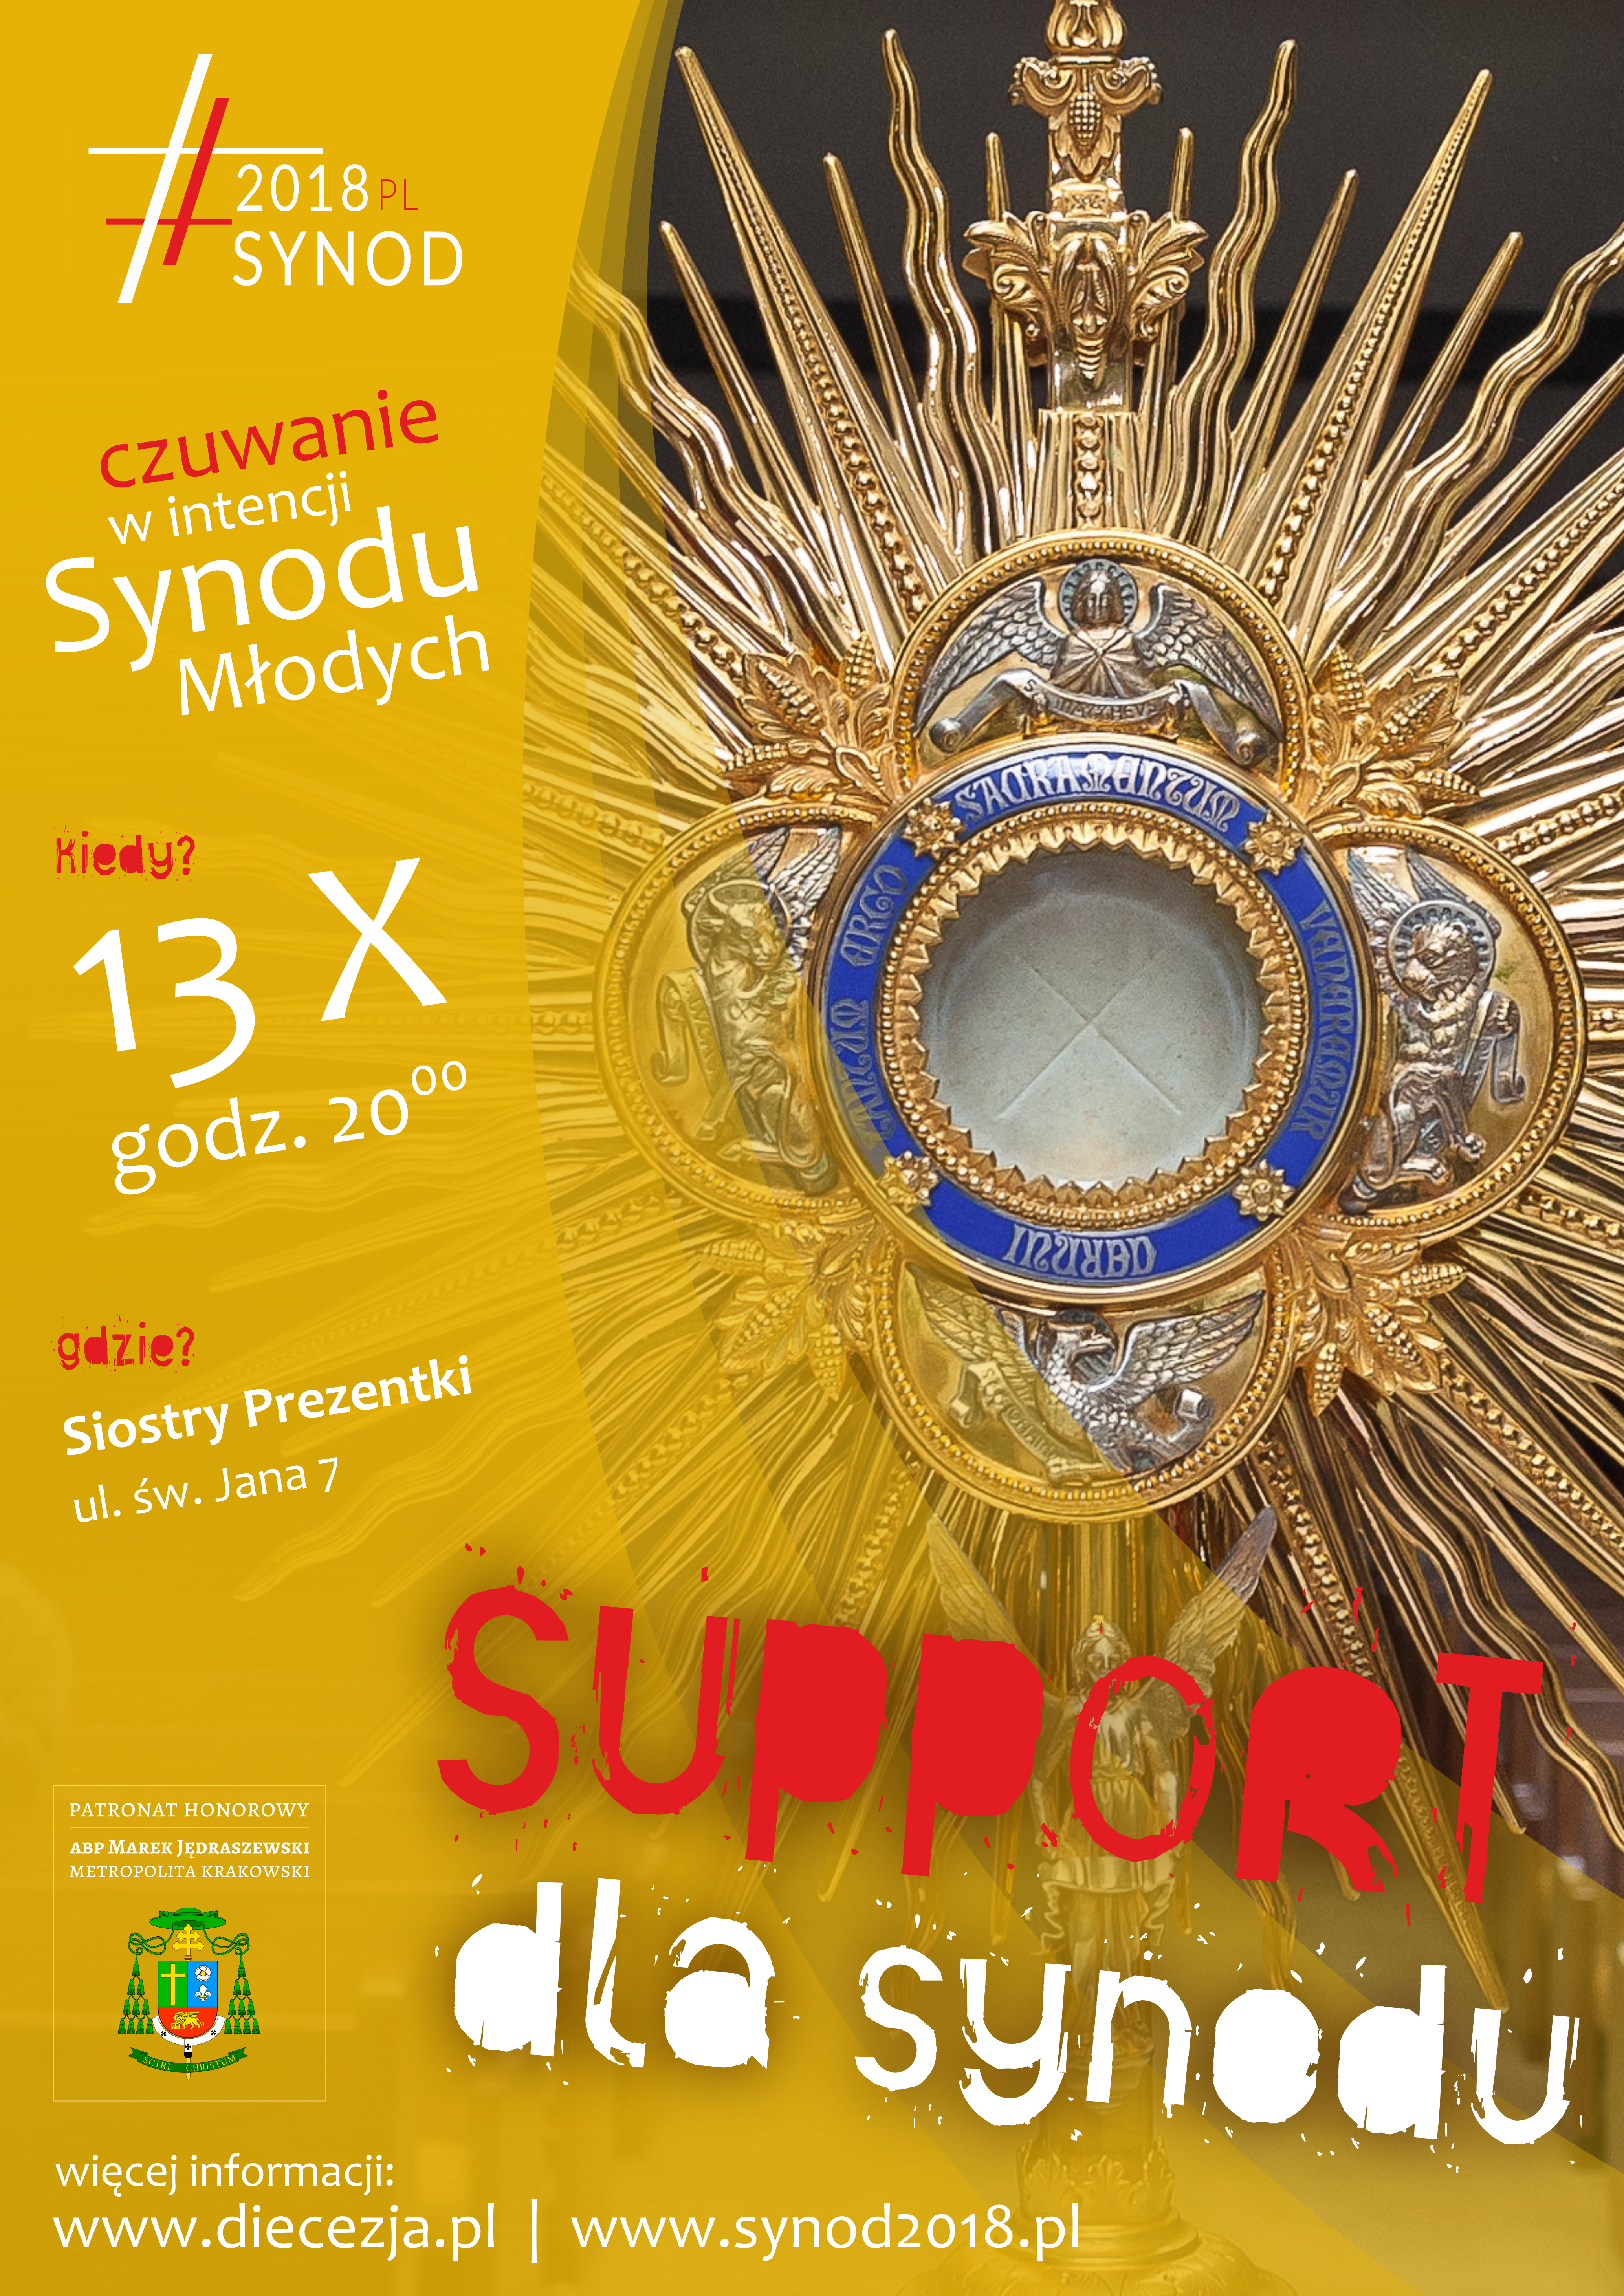 Support dla Synodu u Prezentek